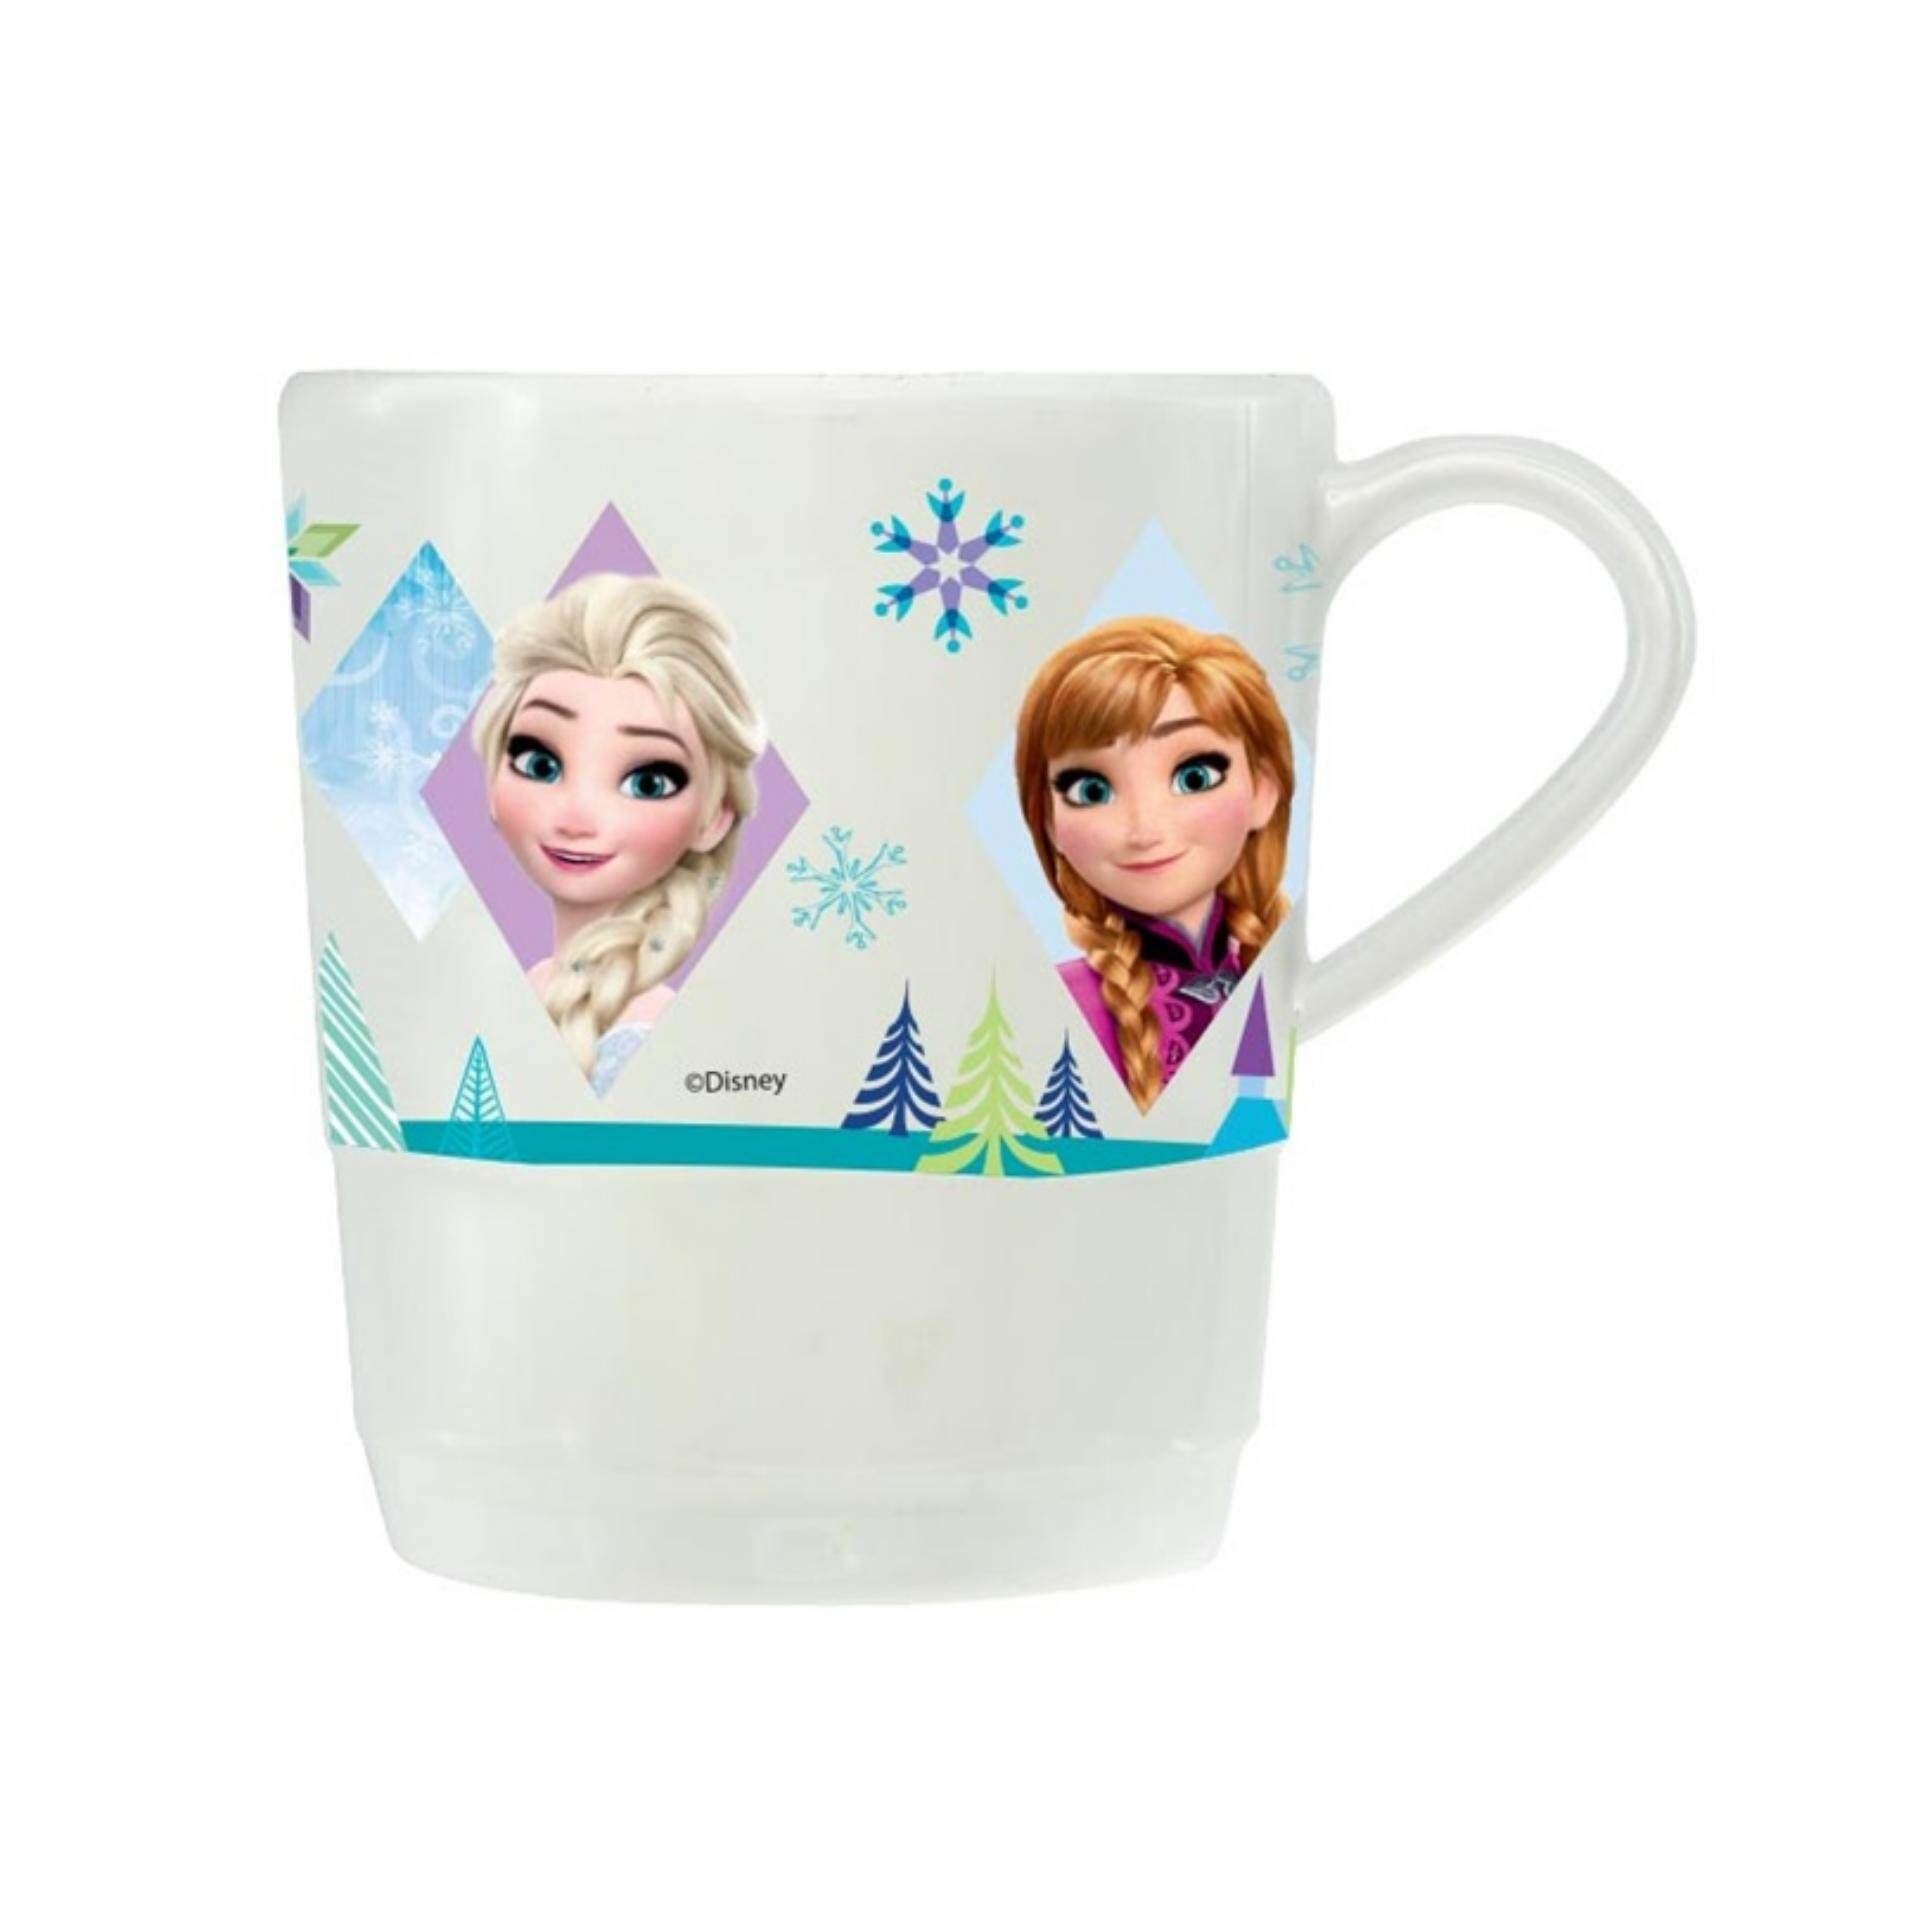 Disney Princess Frozen Step Mug 3 Inches - White Colour